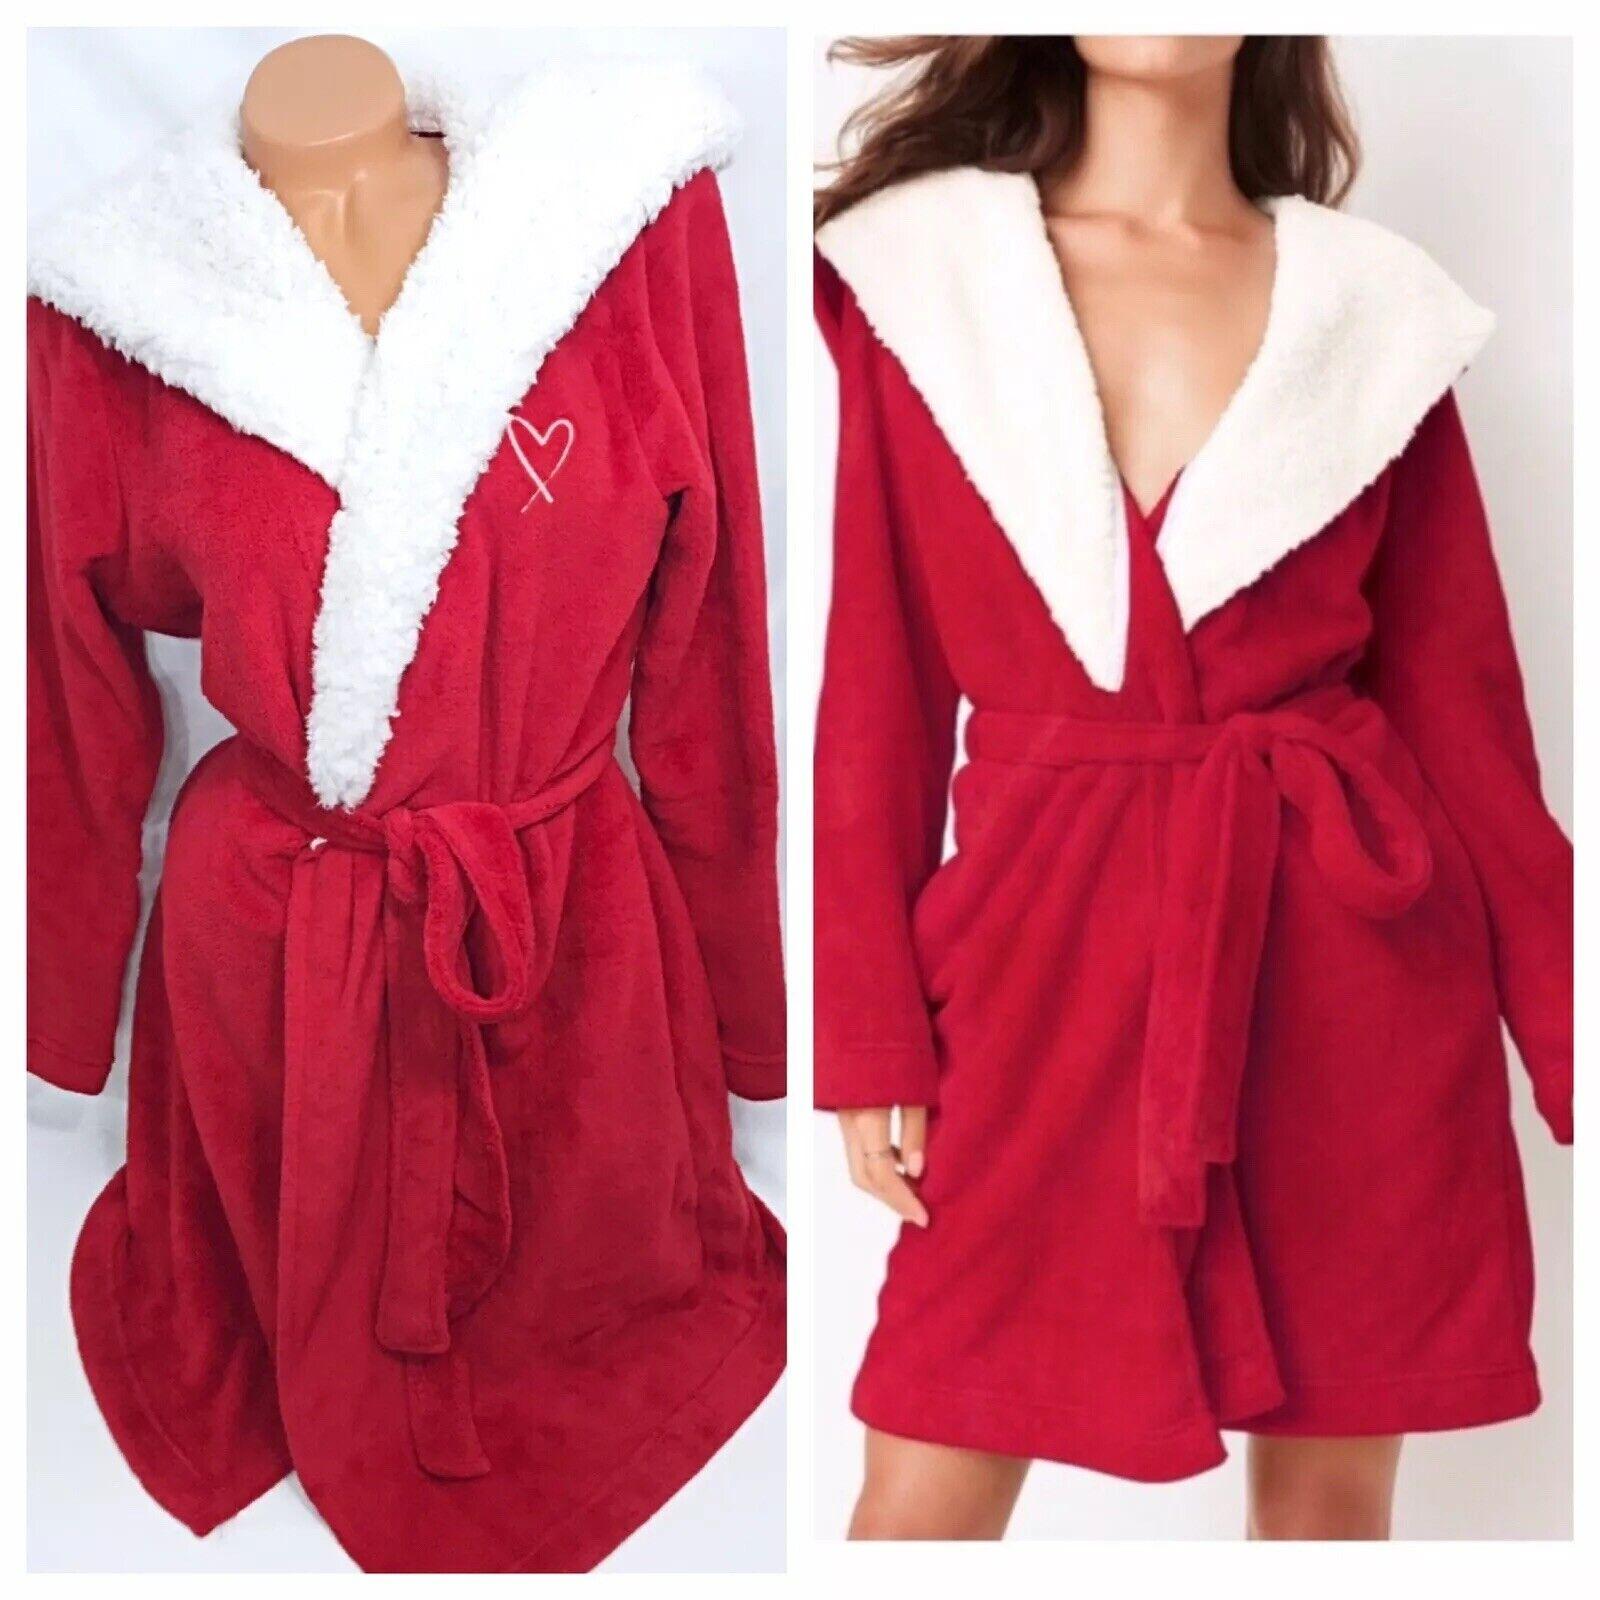 Victoria's Secret RED Bath ROBE +HOOD Cozy Sherpa Fleece HEART Monogram New XS S